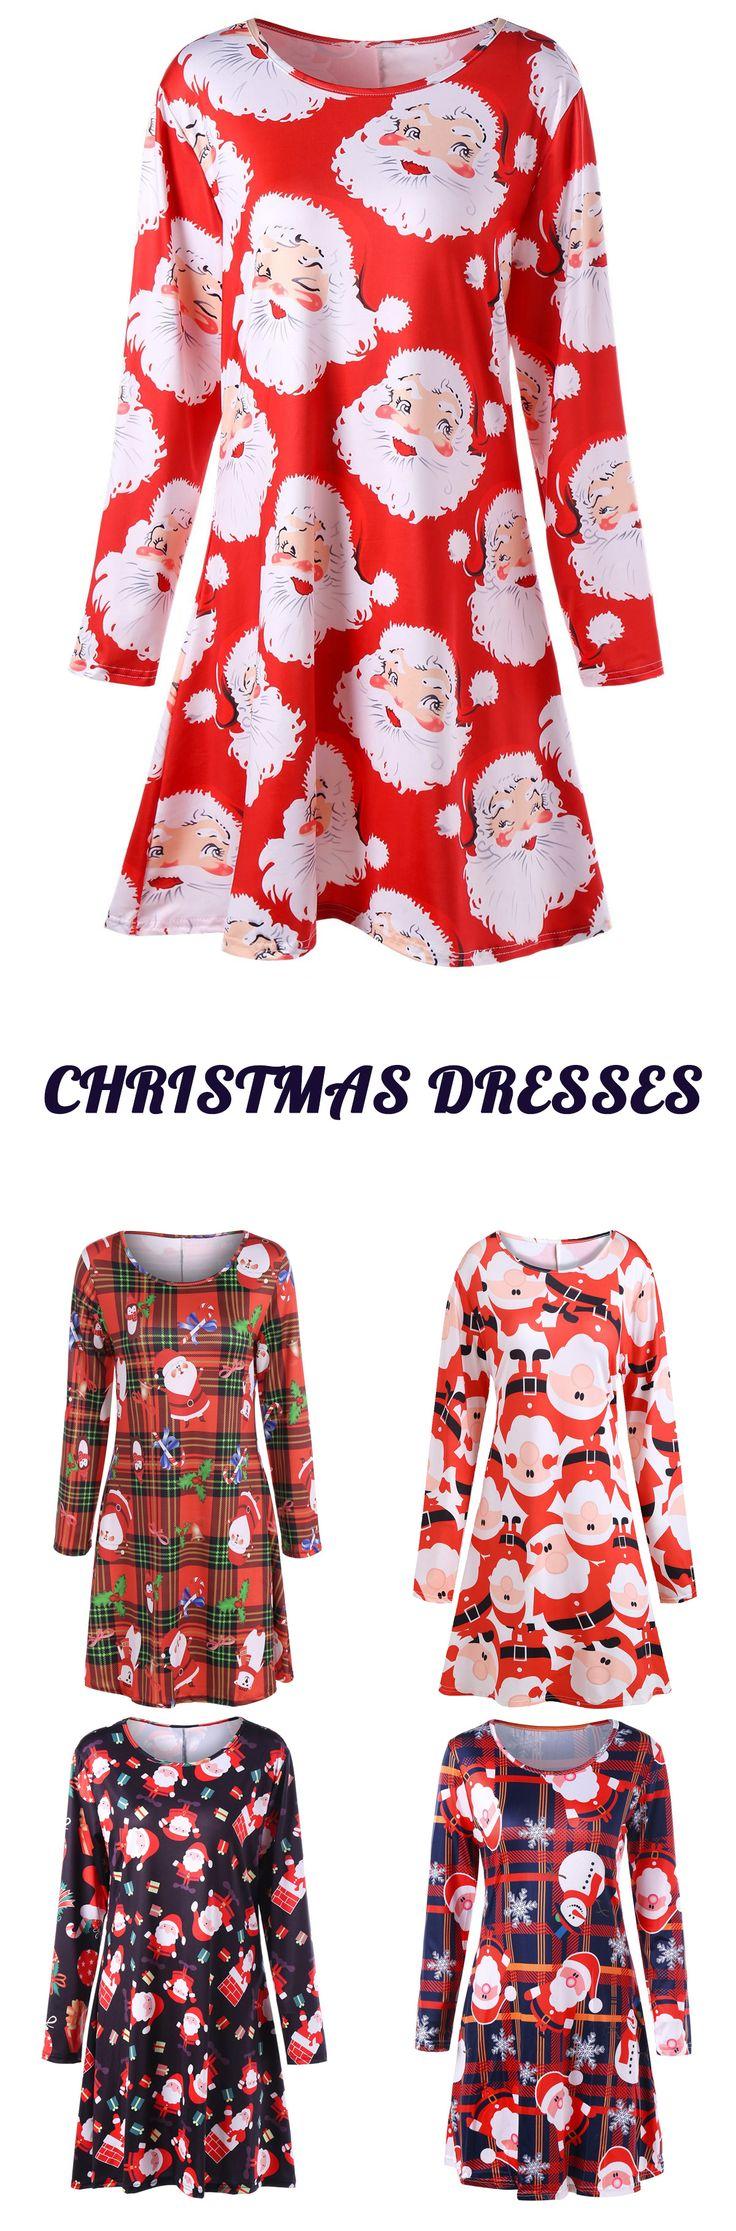 Up to 80% off,Plus Size Santa Claus Print Mini Swing Dress | rosewholesale,rosewholesale.com,rosewholesale plus size,rosewholesale dress plus size,rosewholesale dress,christmas dress,santa claus dress,plus size,dress,christmas | #rosewholesale #dress #christmas #plussize